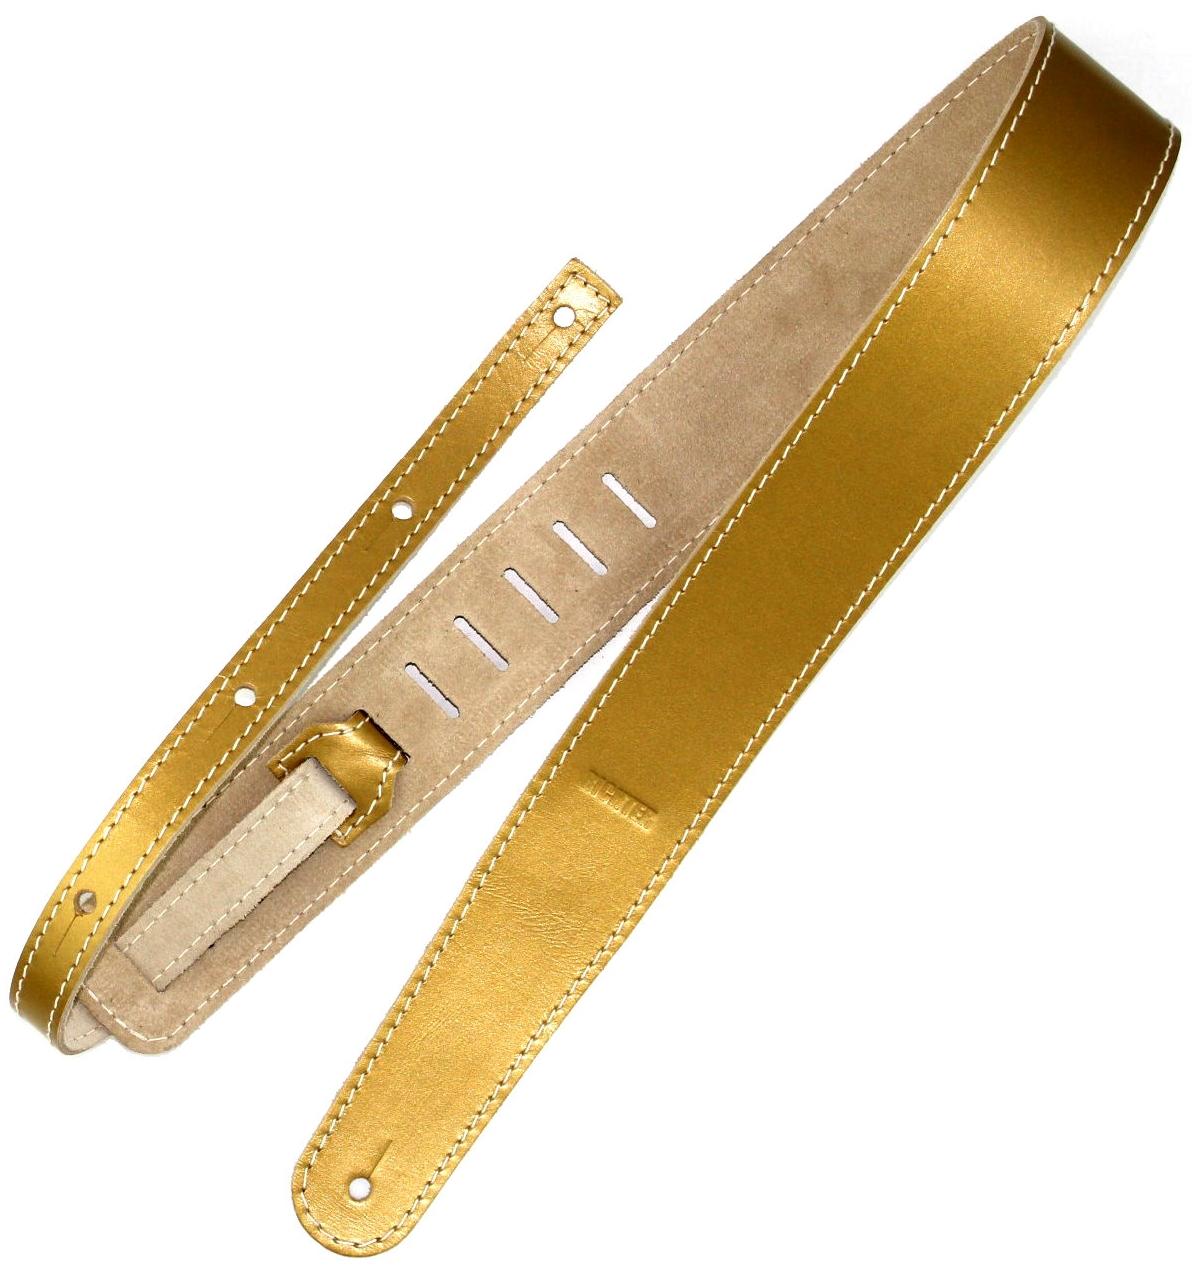 RICHTER Raw II Metallic Gold